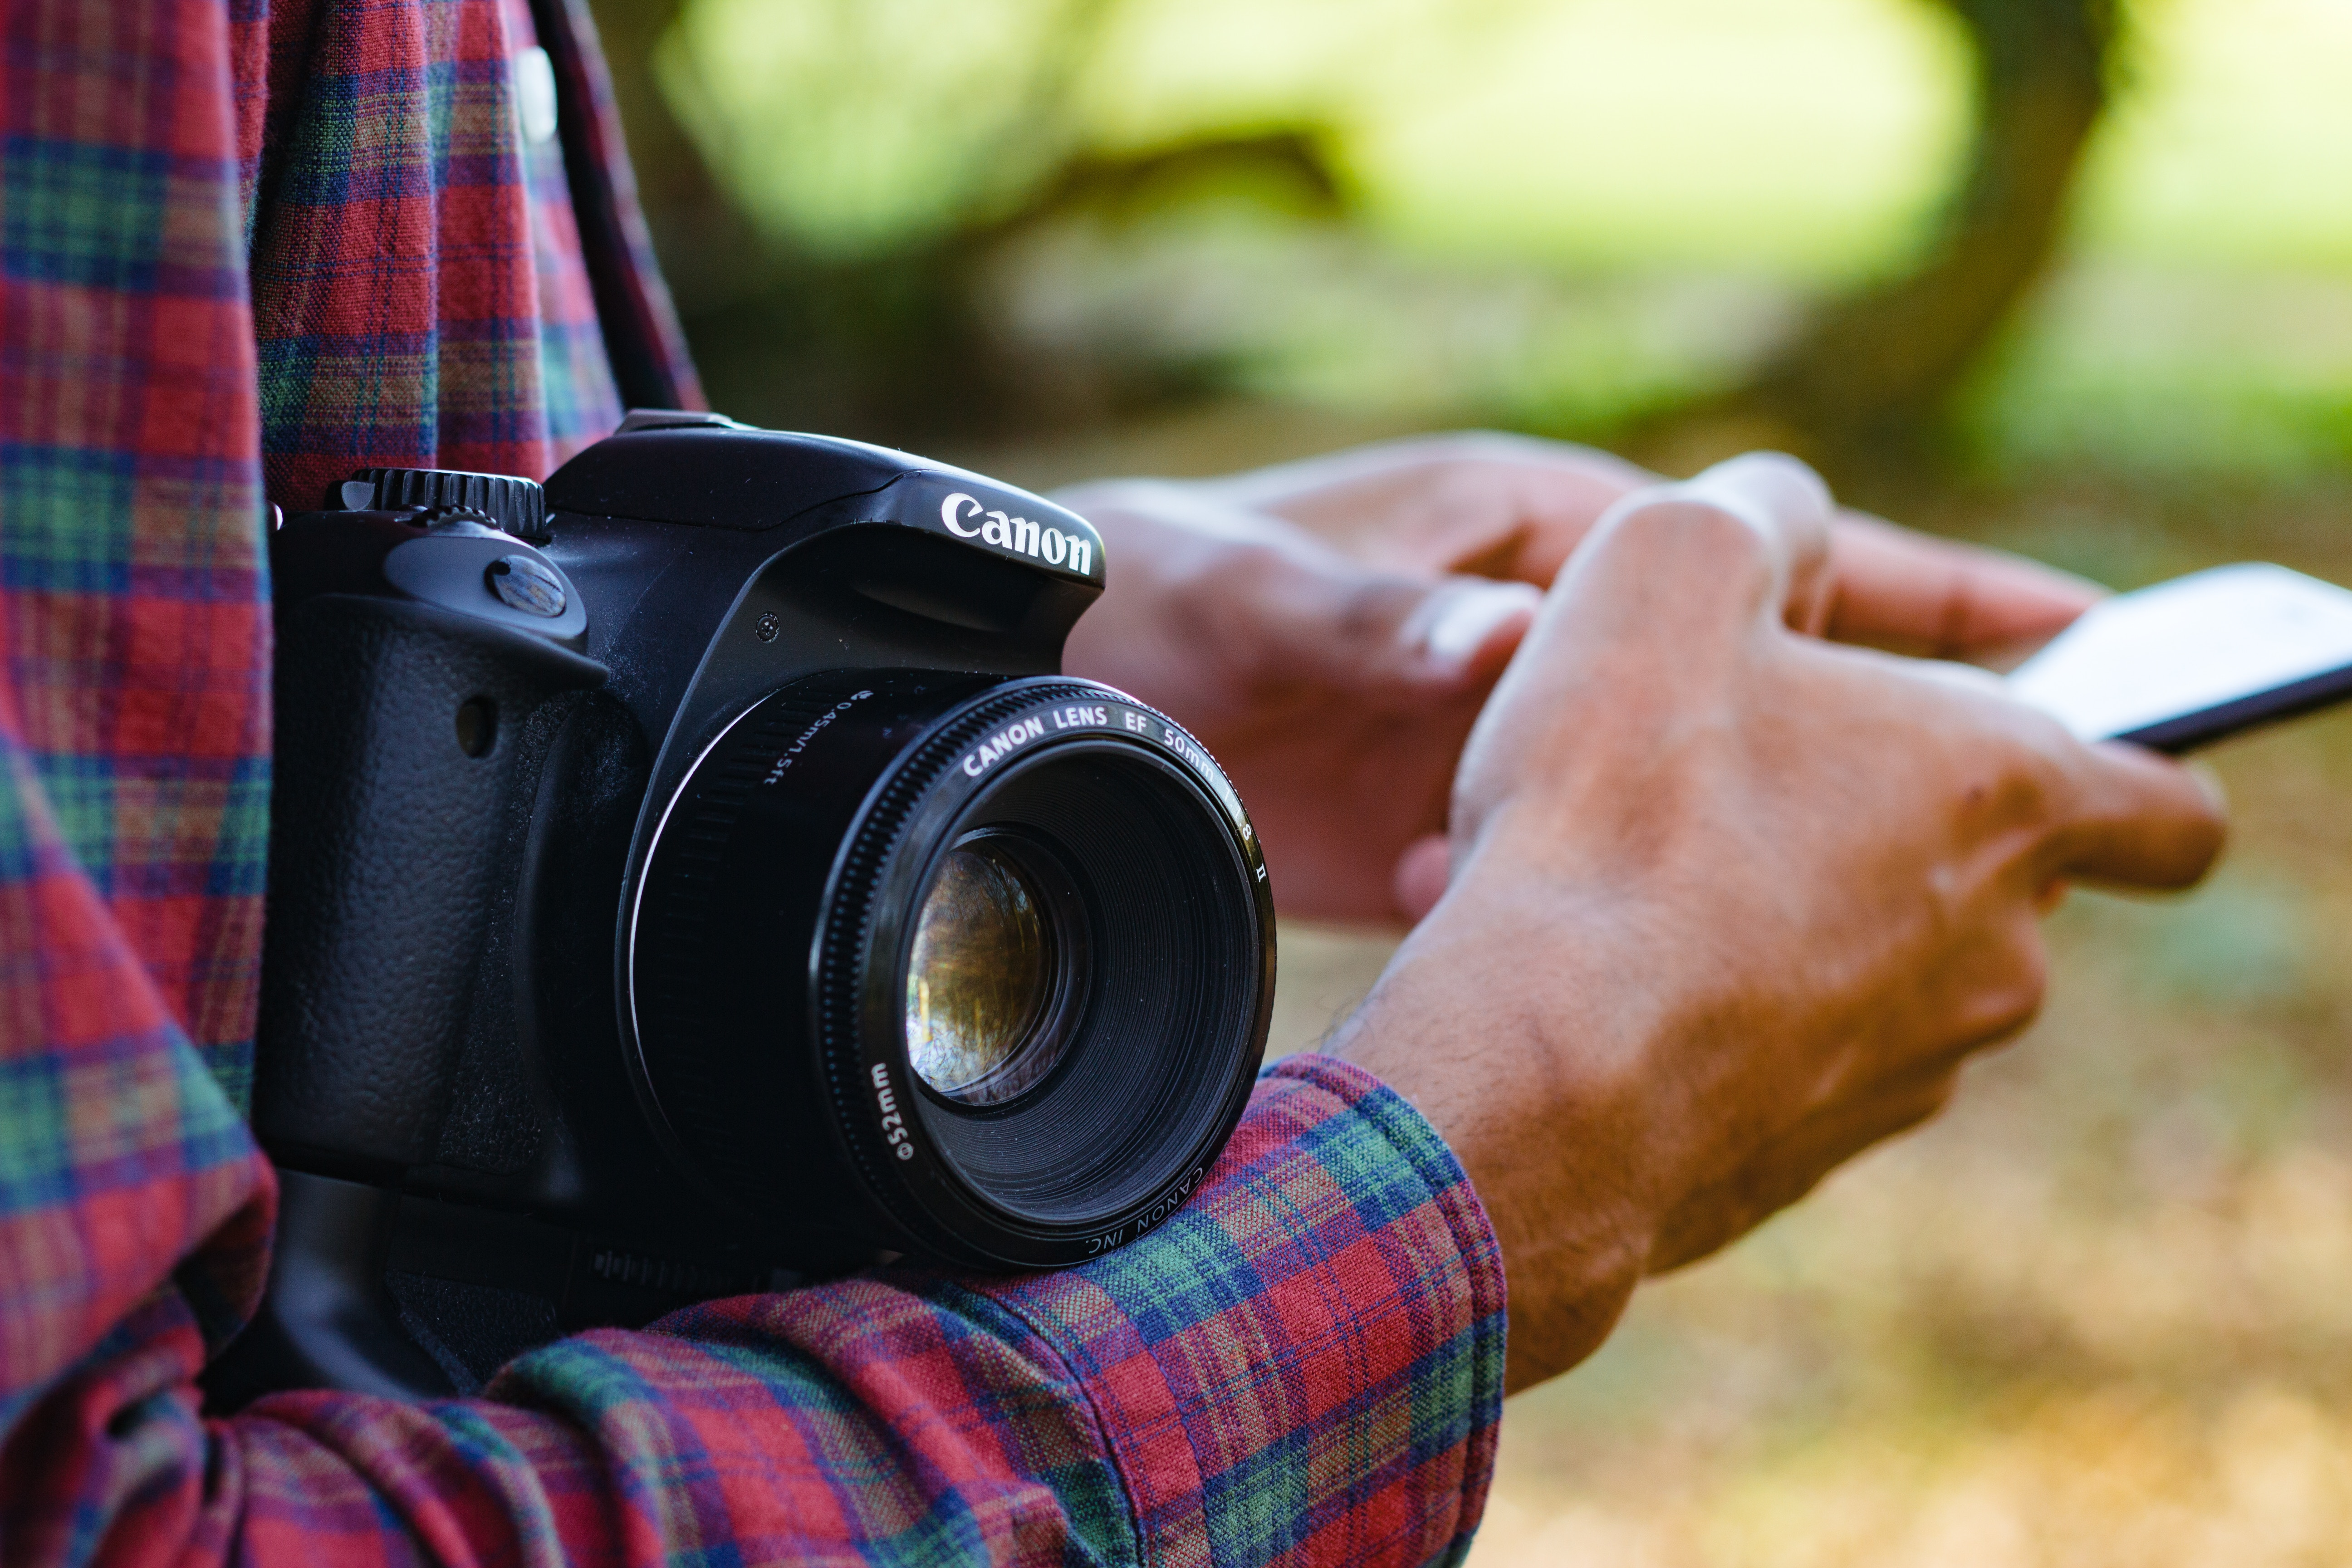 5 Cursos De Fotografia Online Para Se Tornar Num Quase Profissional